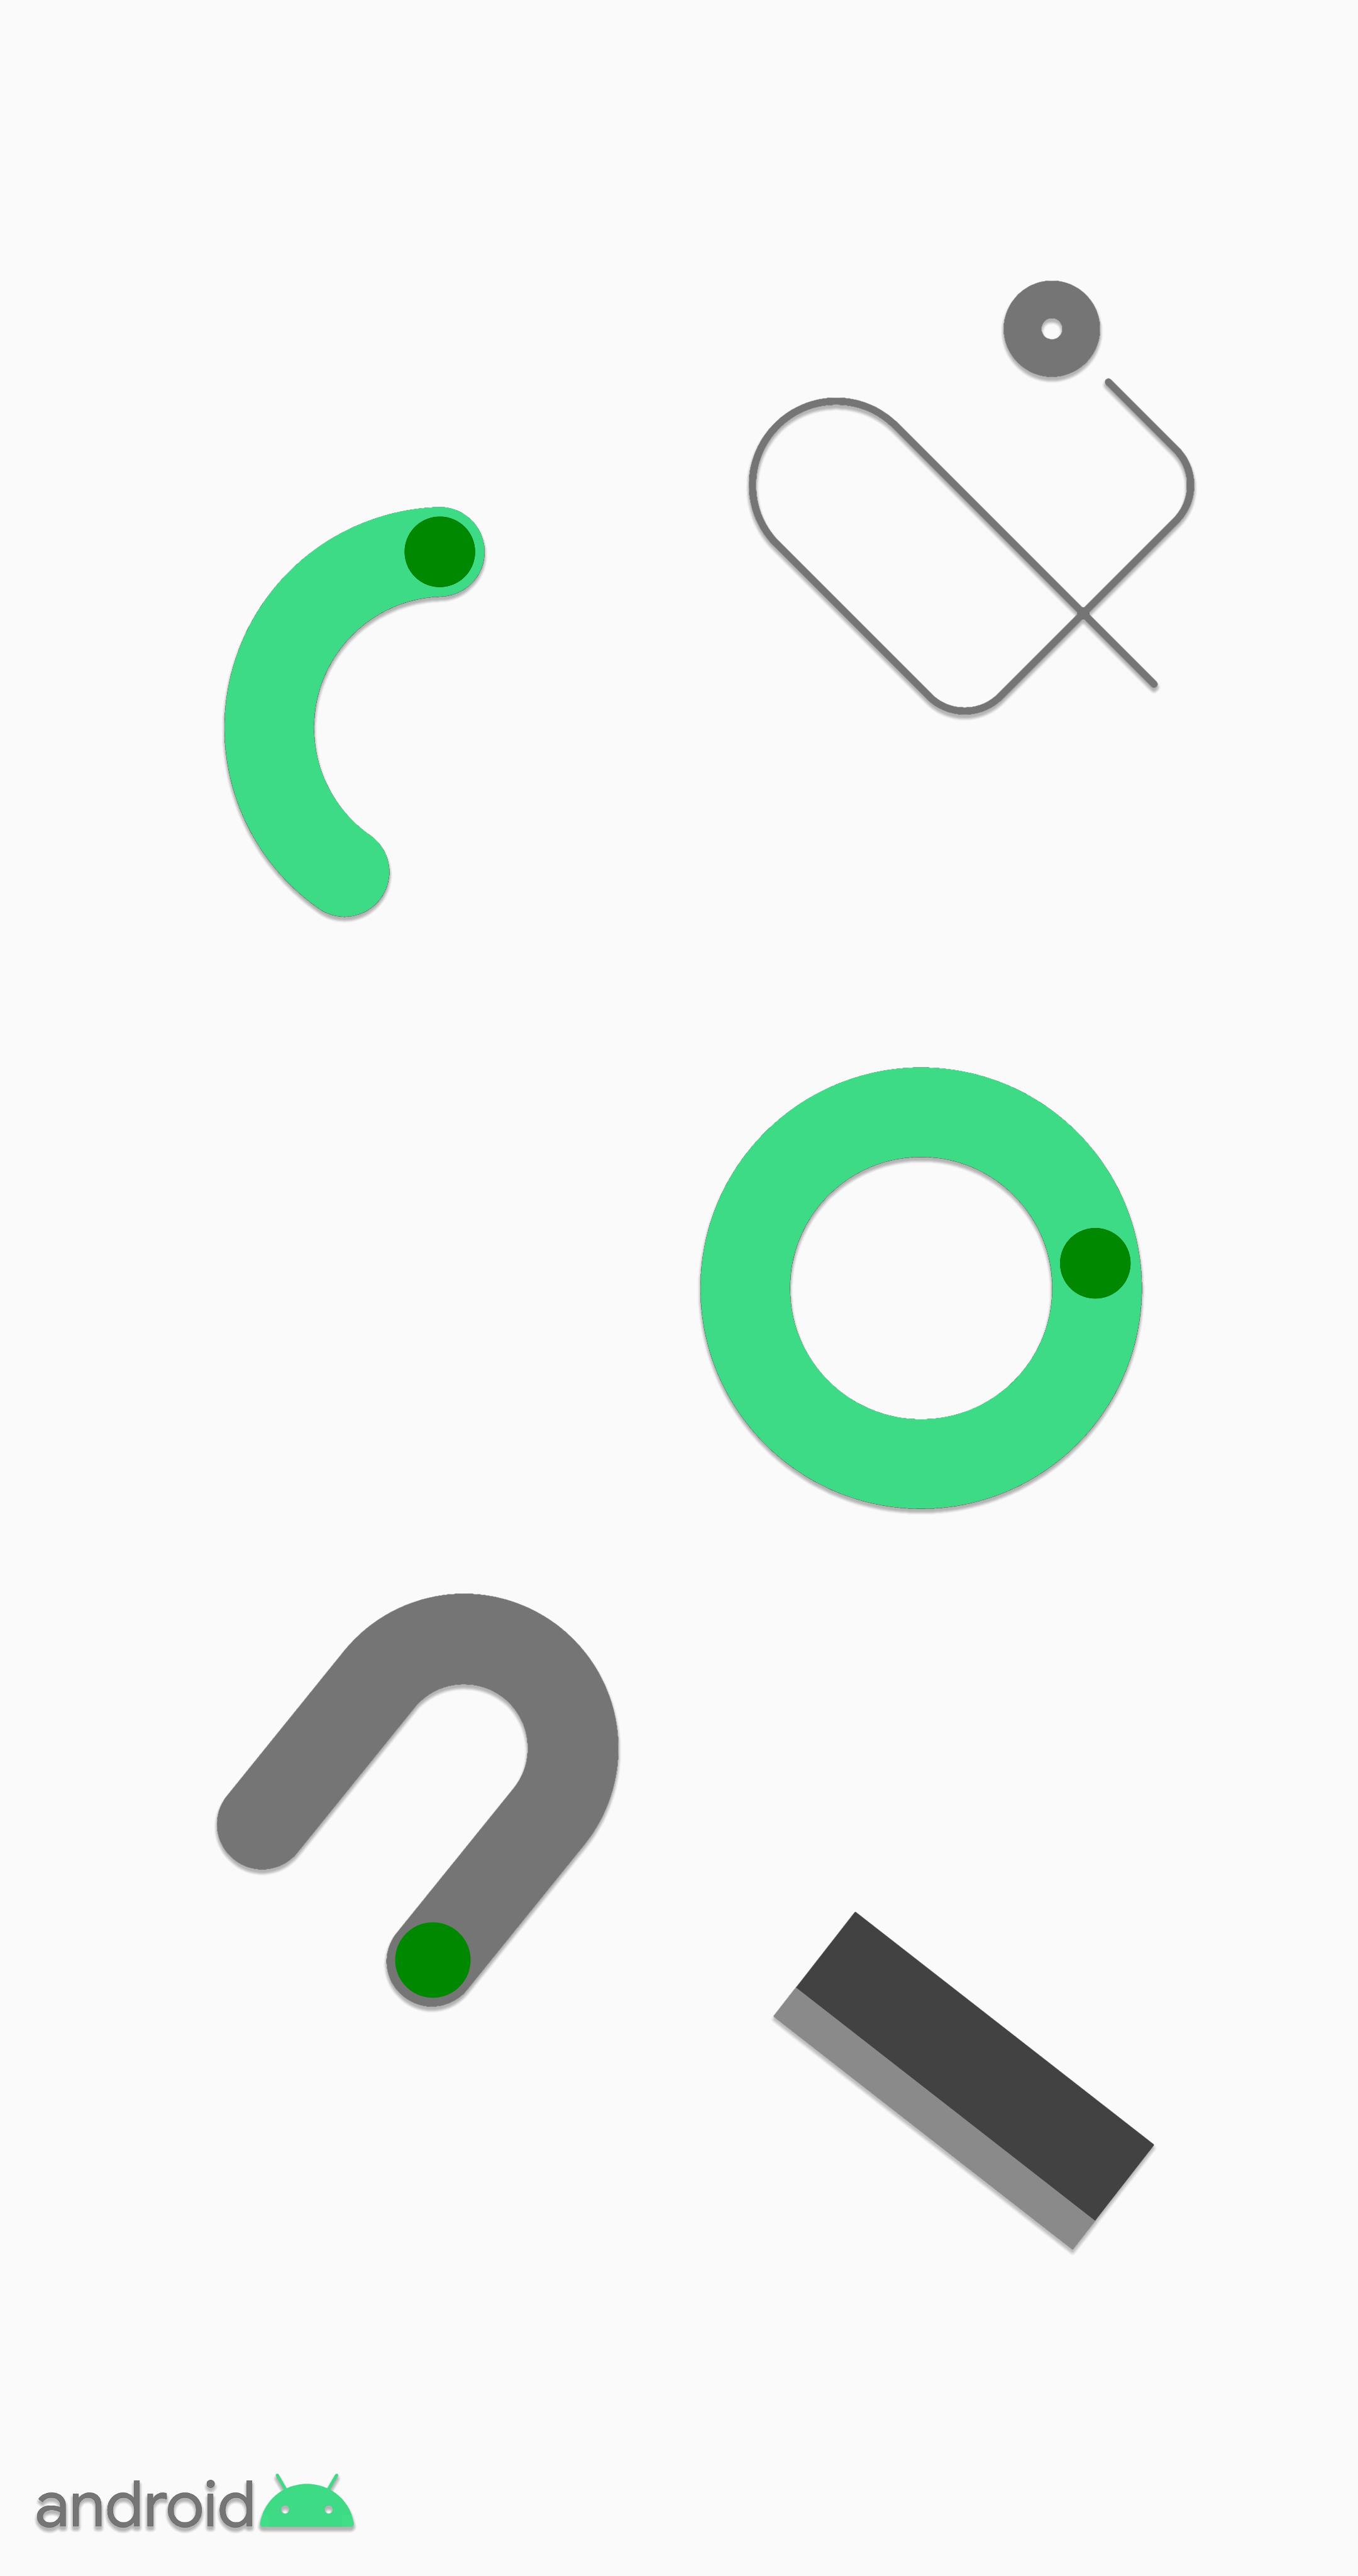 Google Pixel 4 Wallpaper (YTECHB Exclusive)